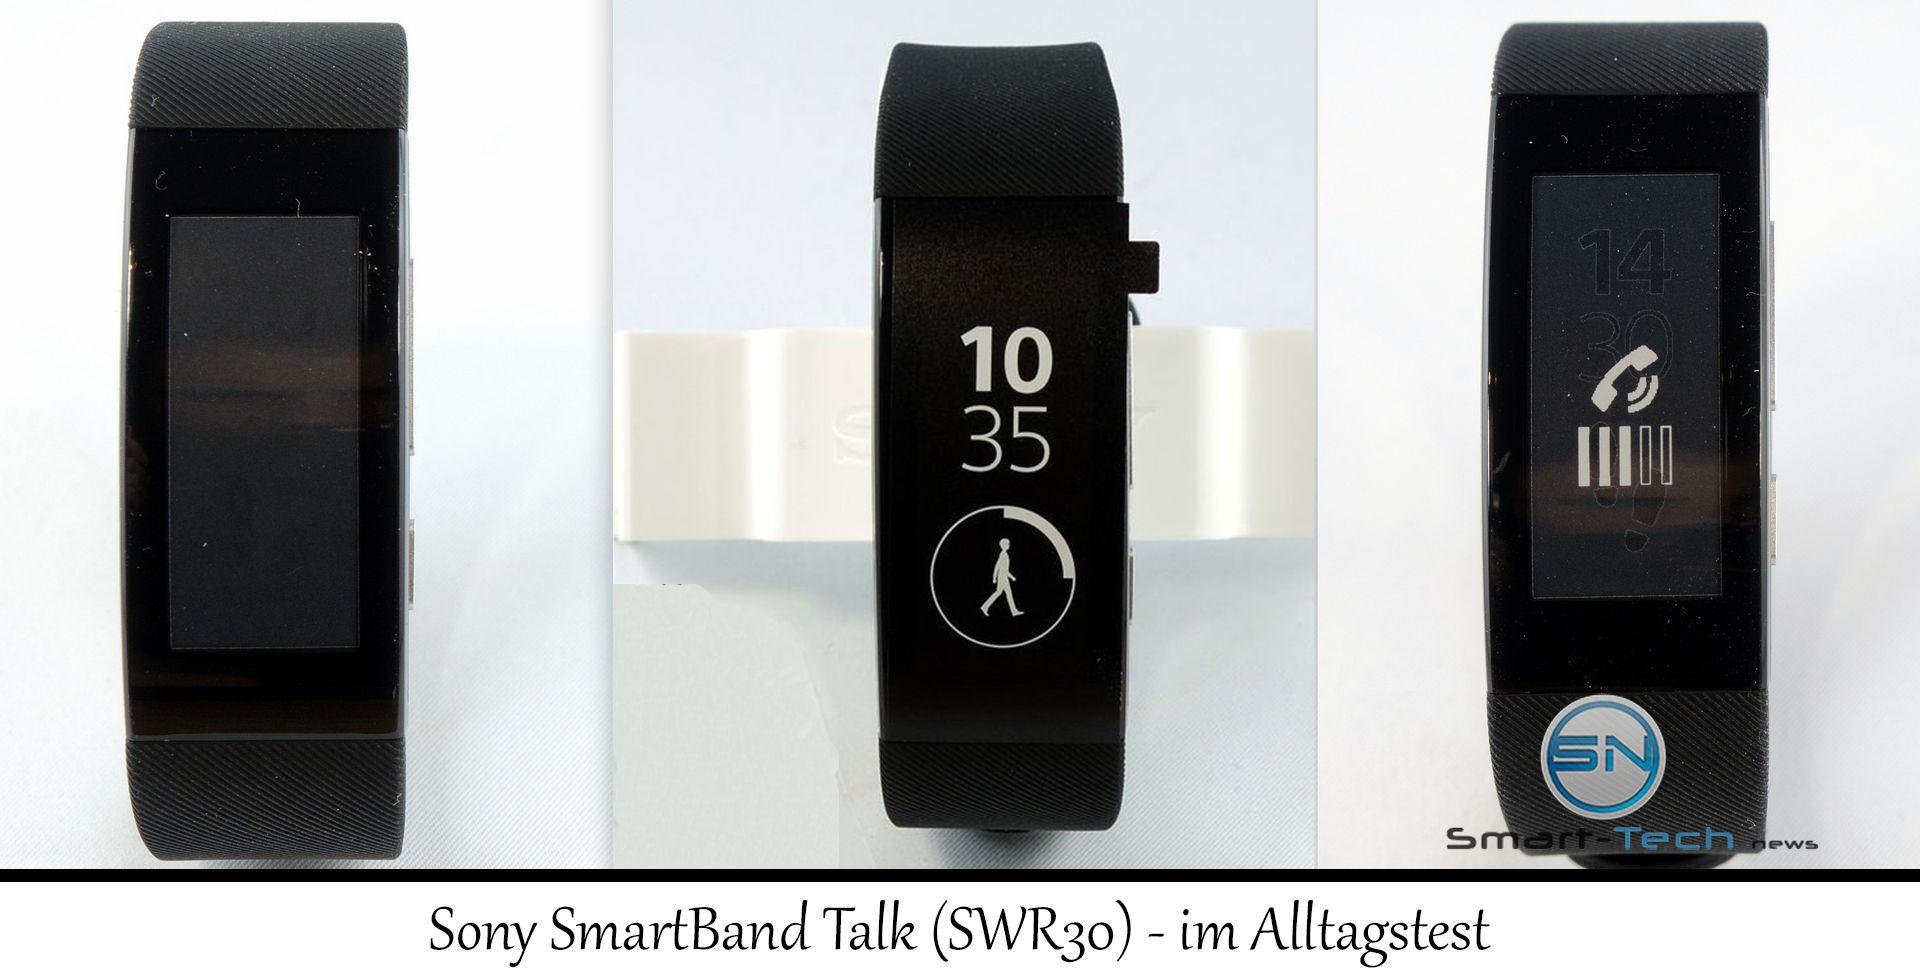 Sony Smartband Talk (SWR30) – im Alltagsplausch